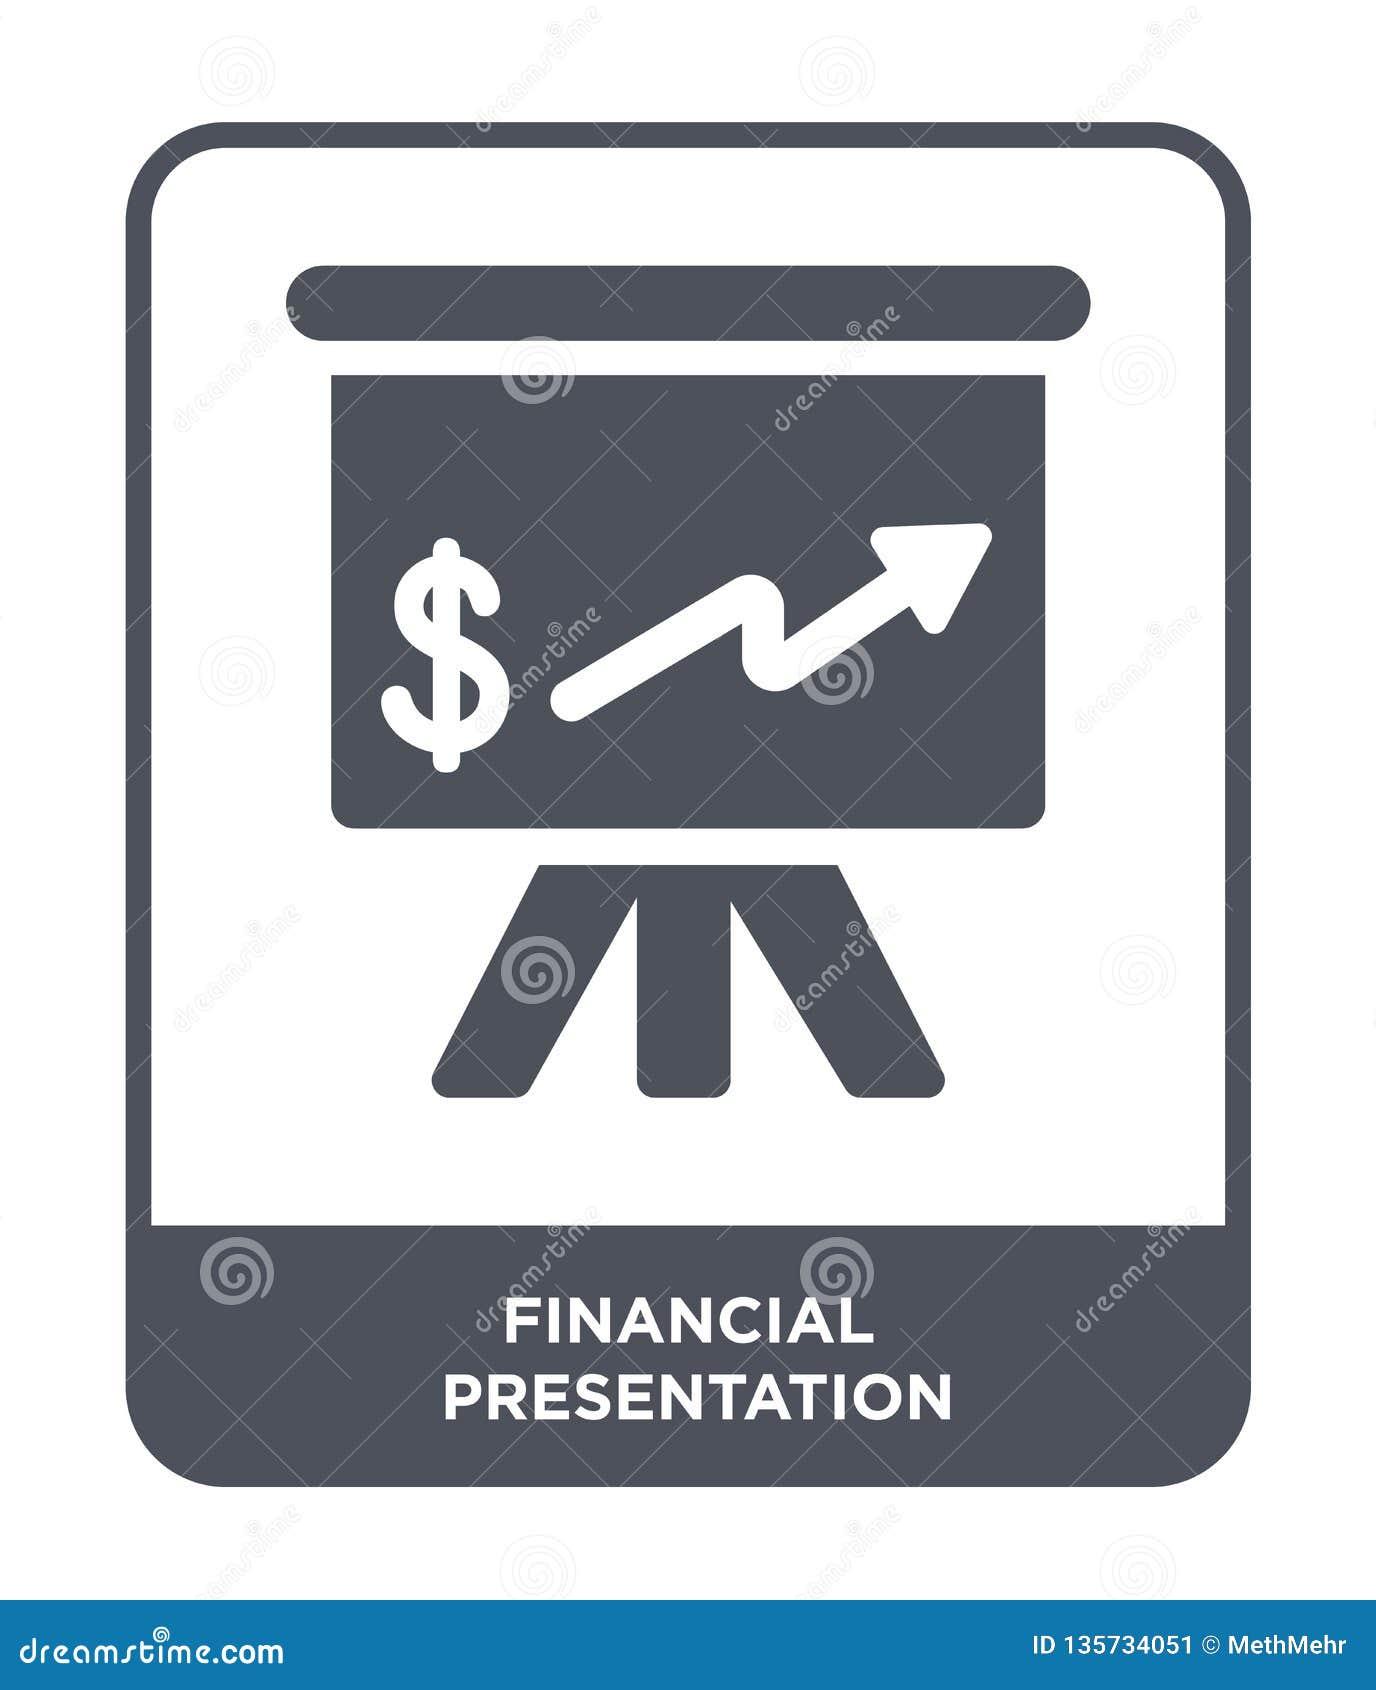 financial presentation icon in trendy design style. financial presentation icon isolated on white background. financial